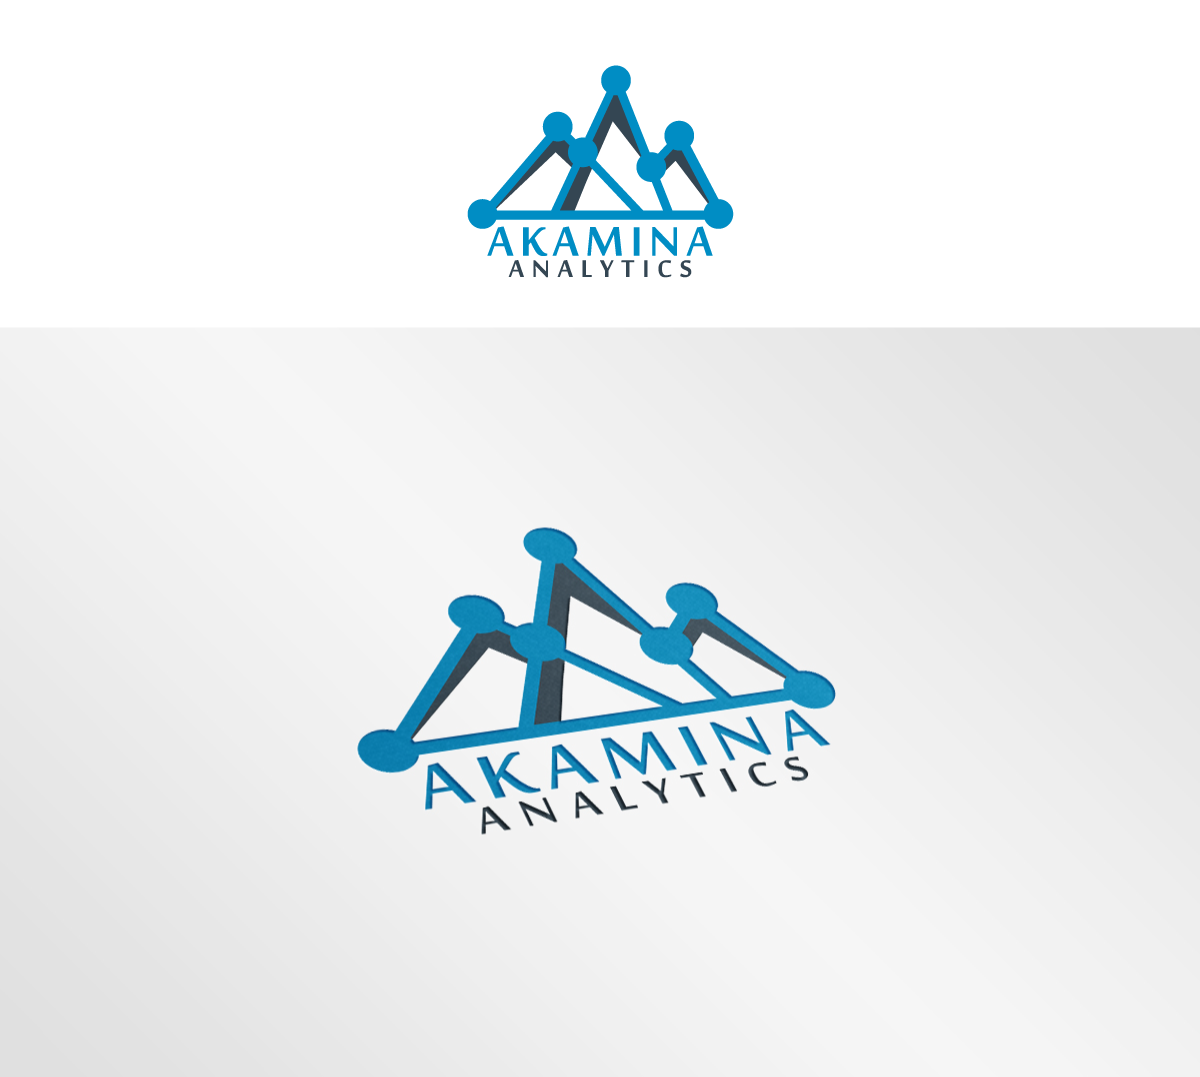 Serious, Modern, Data Science Logo Design for Akamina